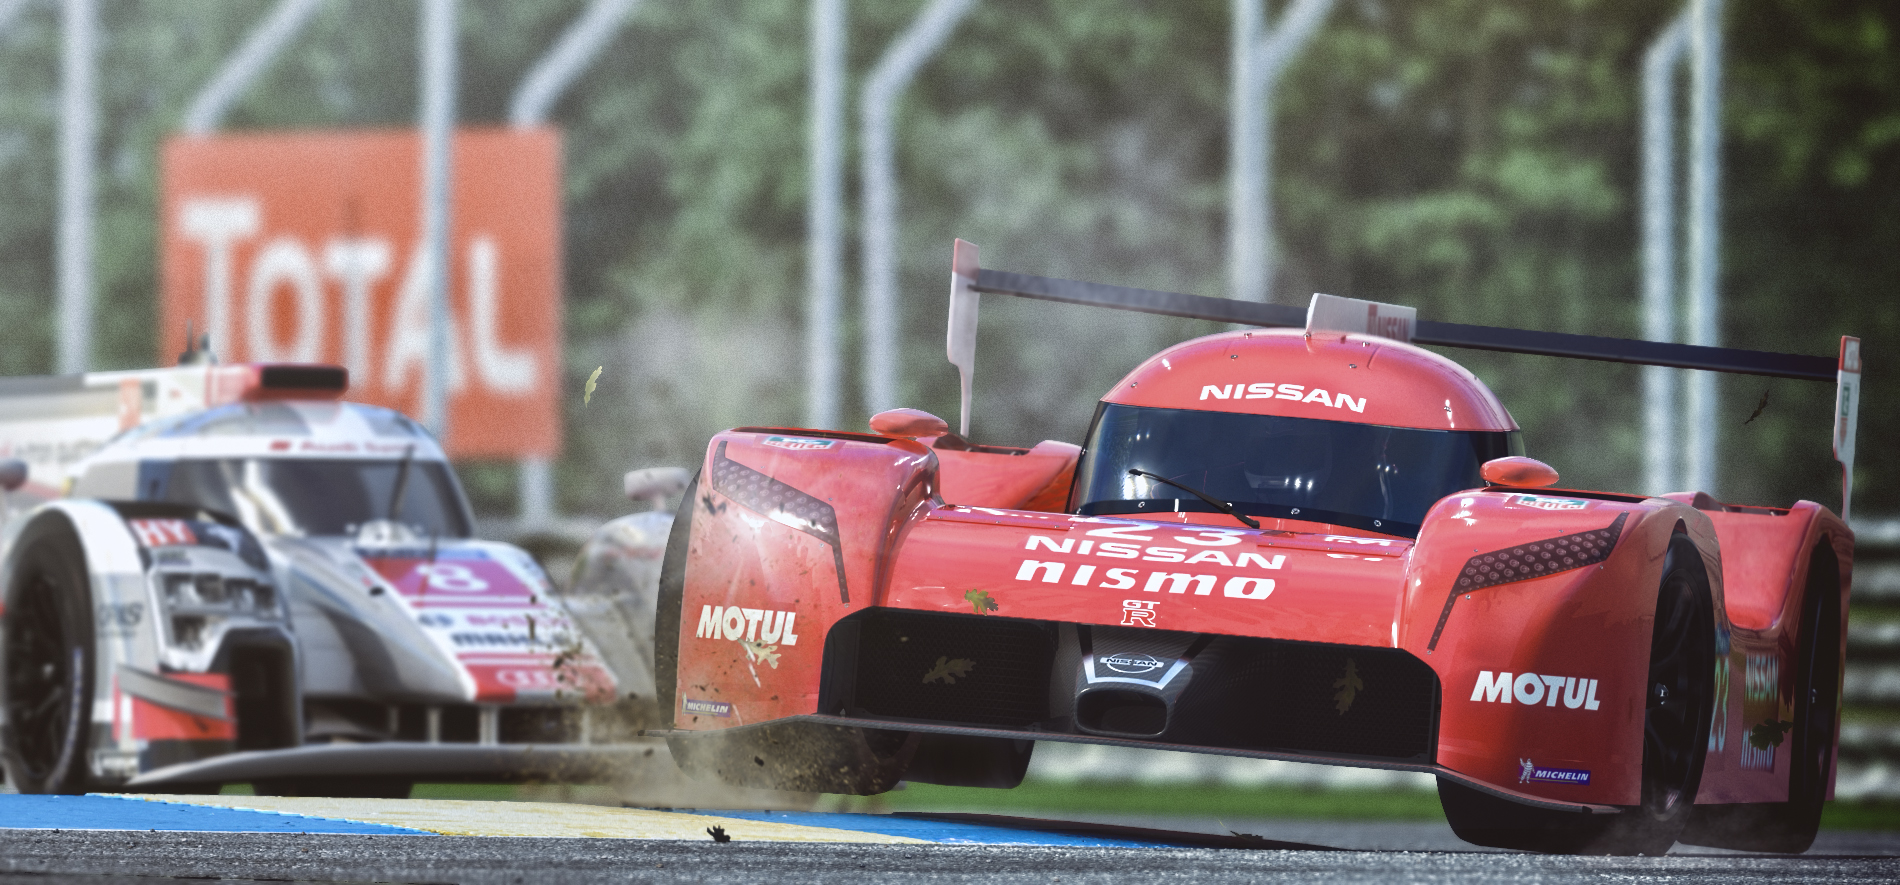 Nissan GT-R LM Nismo 3d art